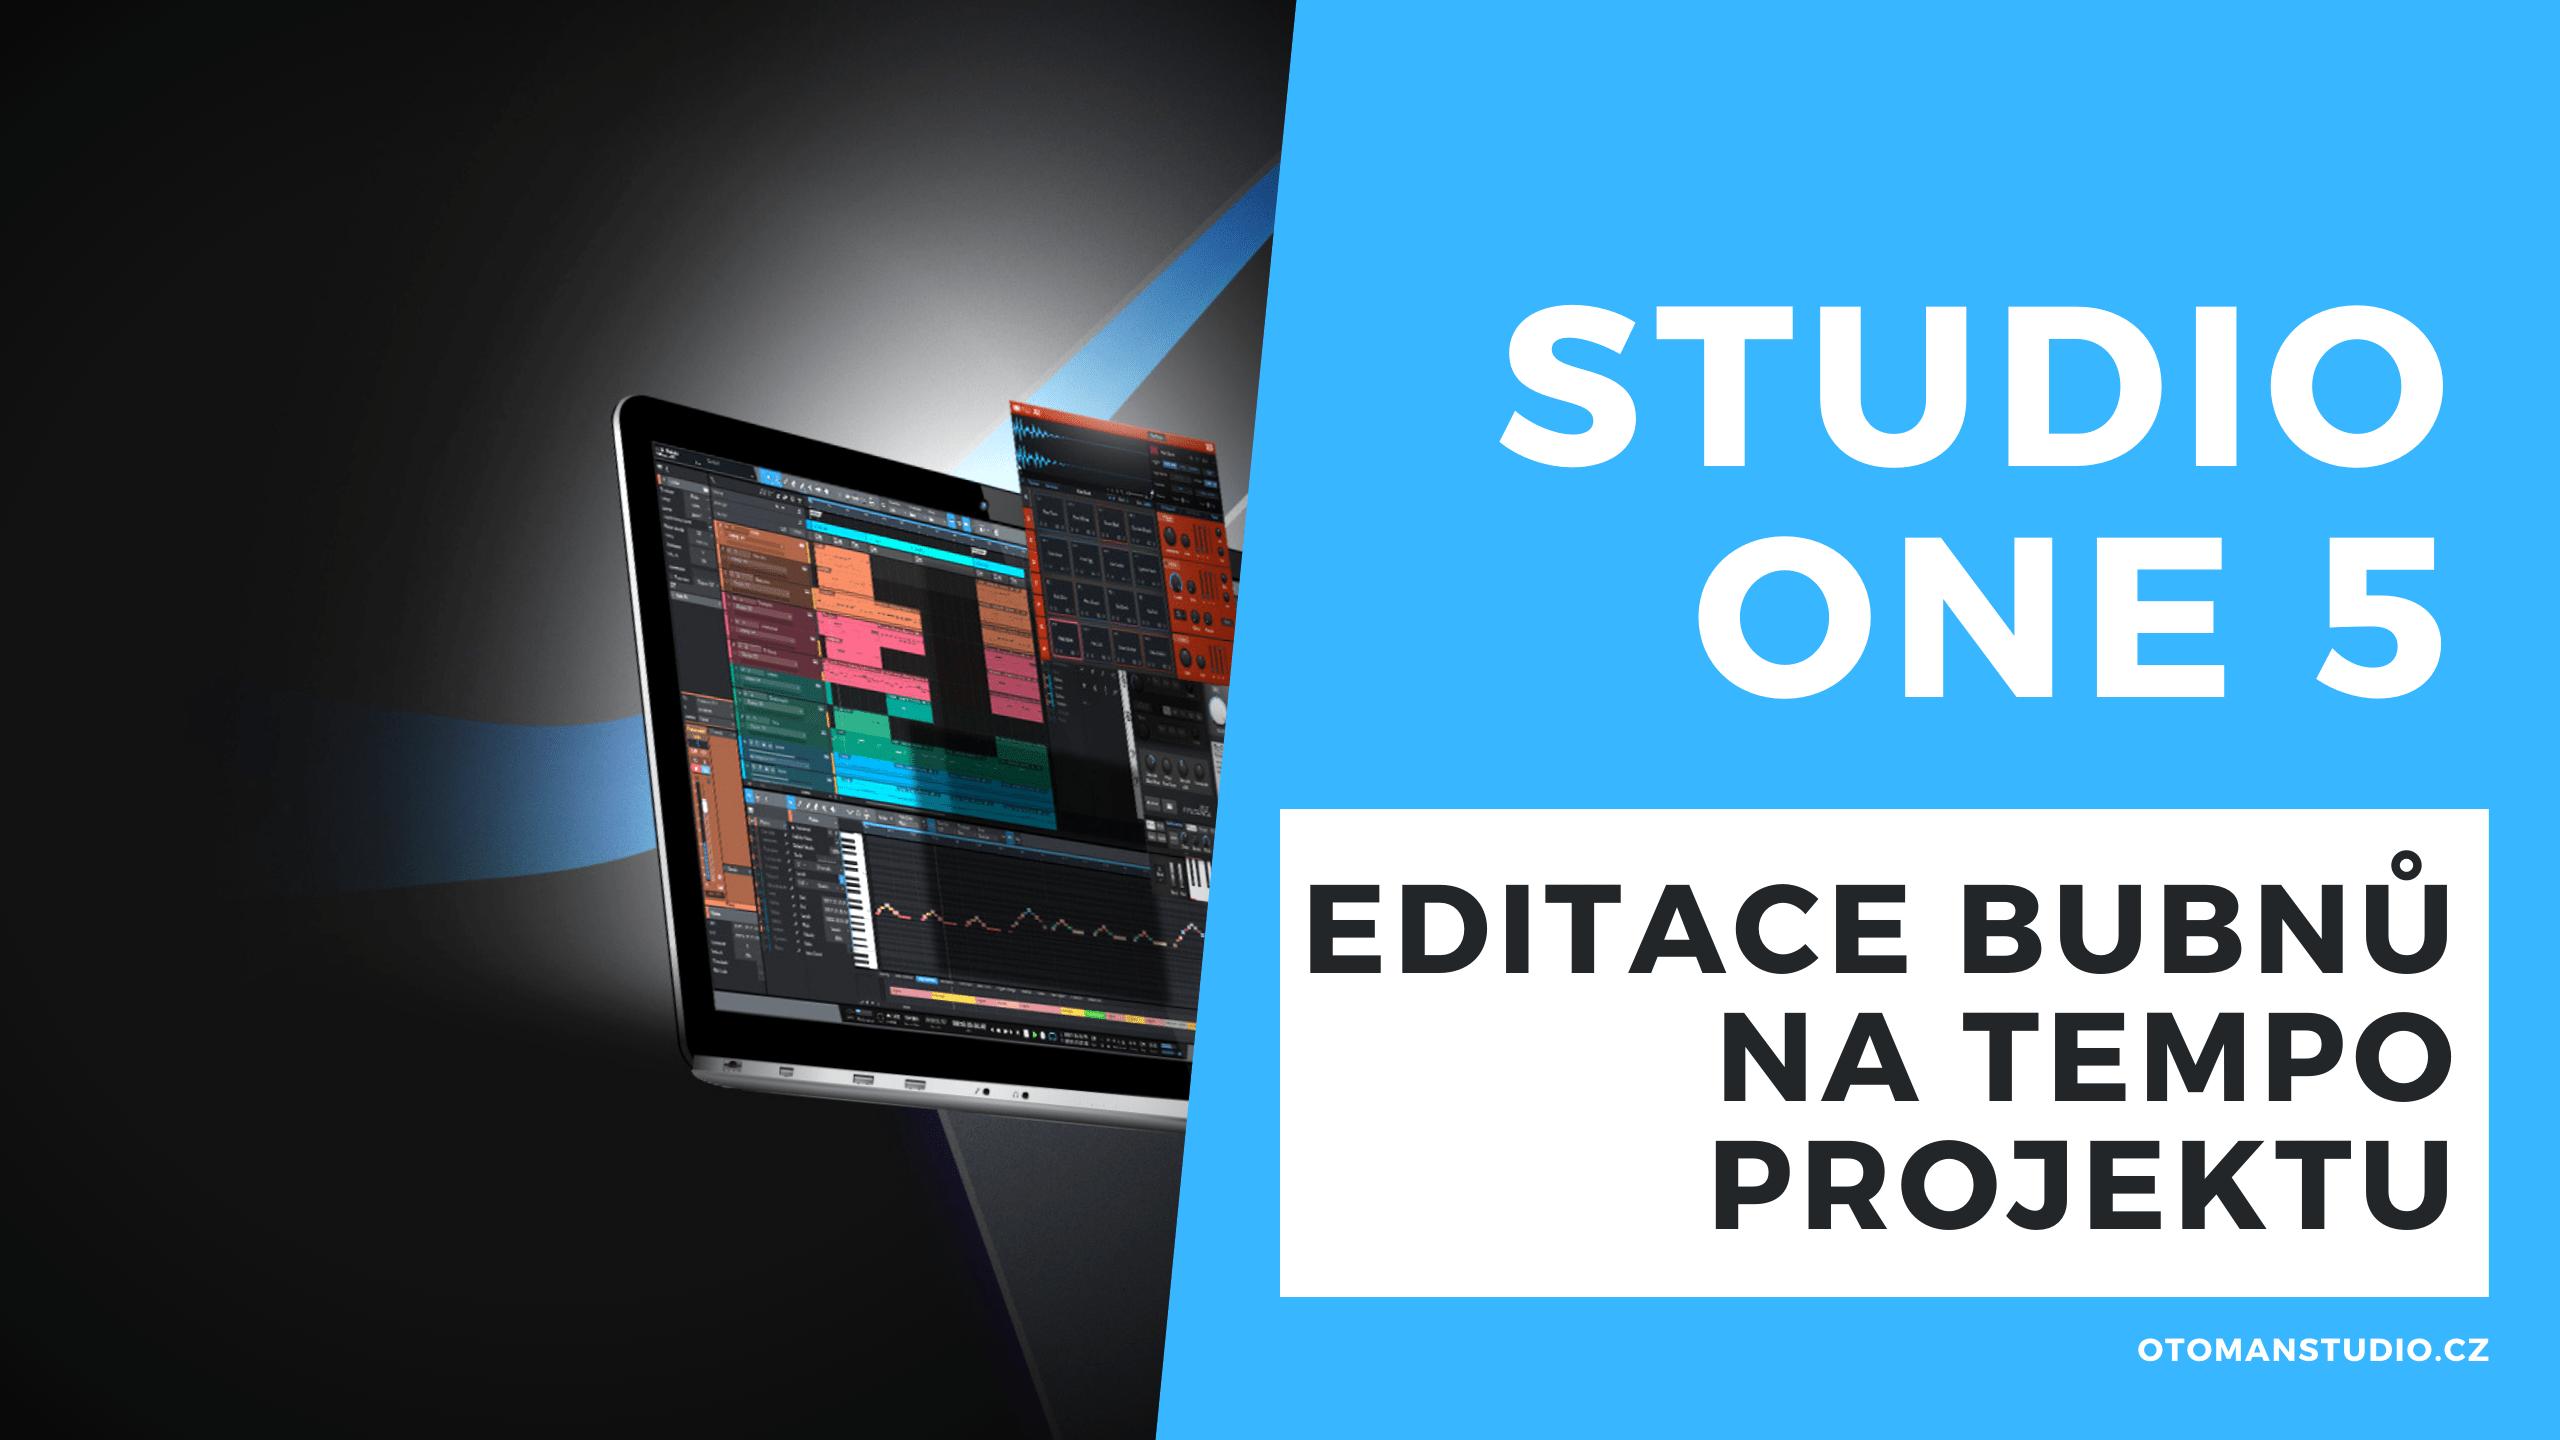 Studio One 5 – Editace bubnů na tempo projektu